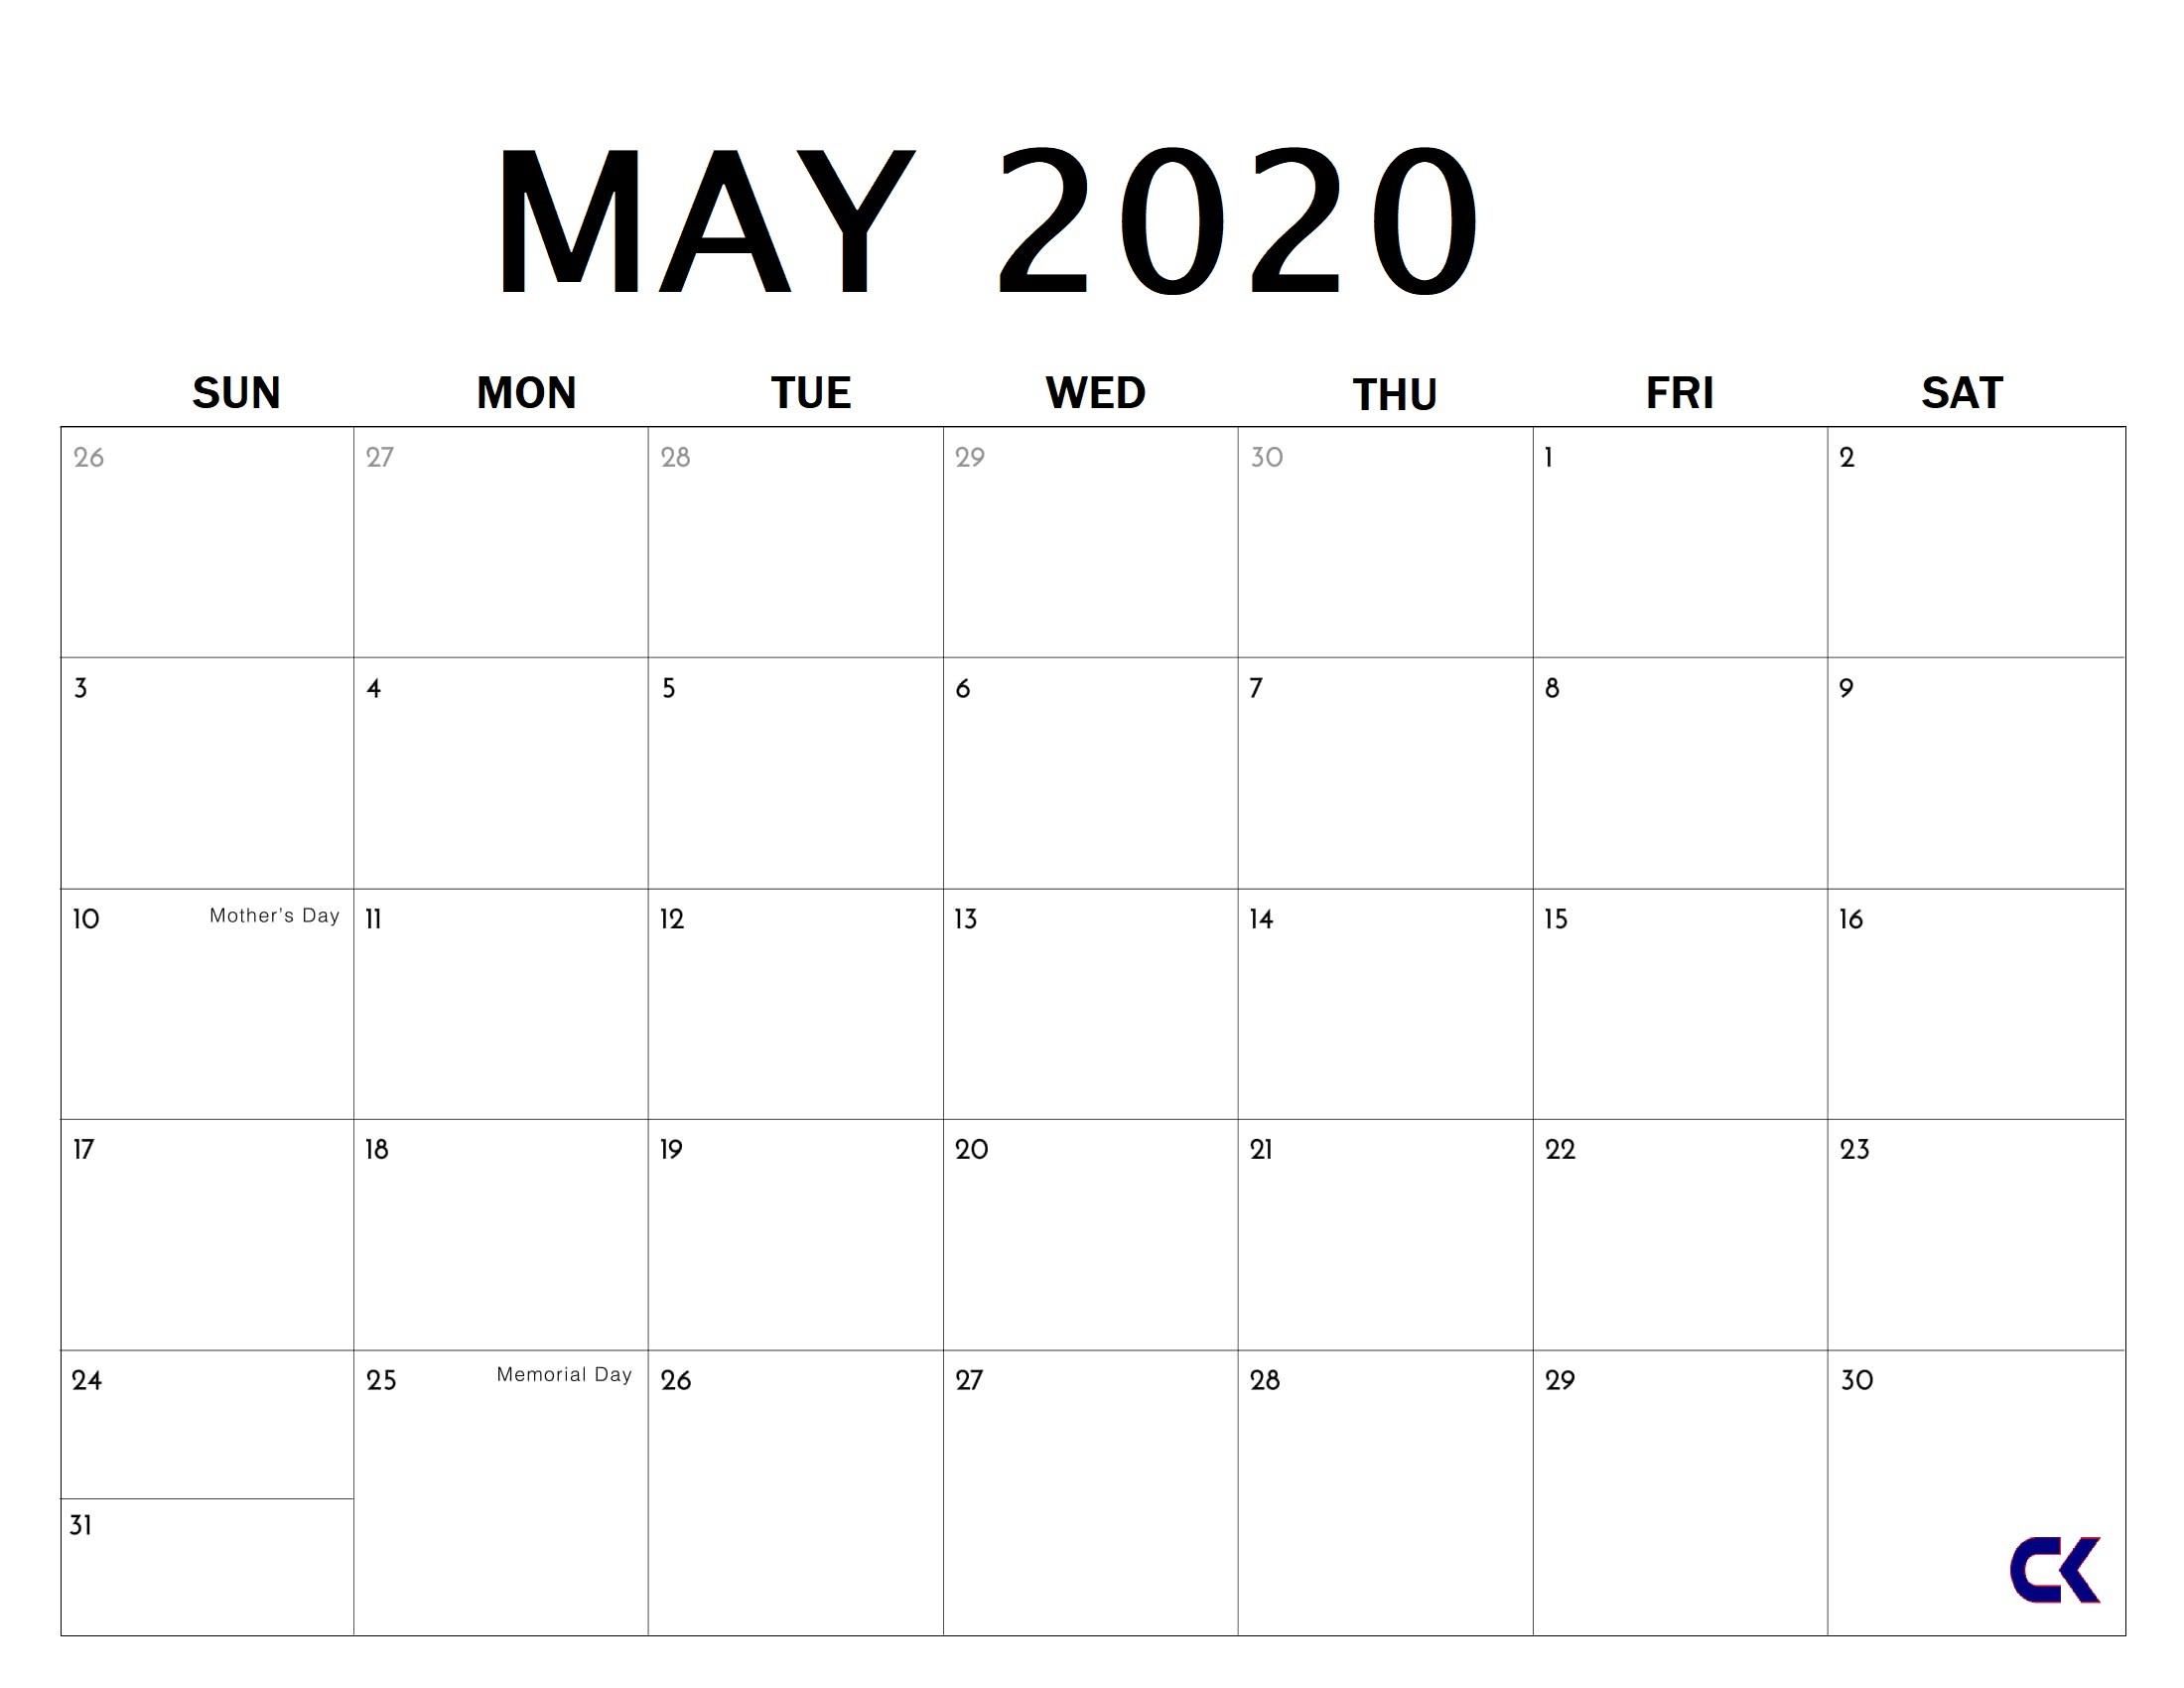 Printable May 2020 Calendar - Calendar-Kart with regard to Free Printable 2020 Calendars Large Numbers